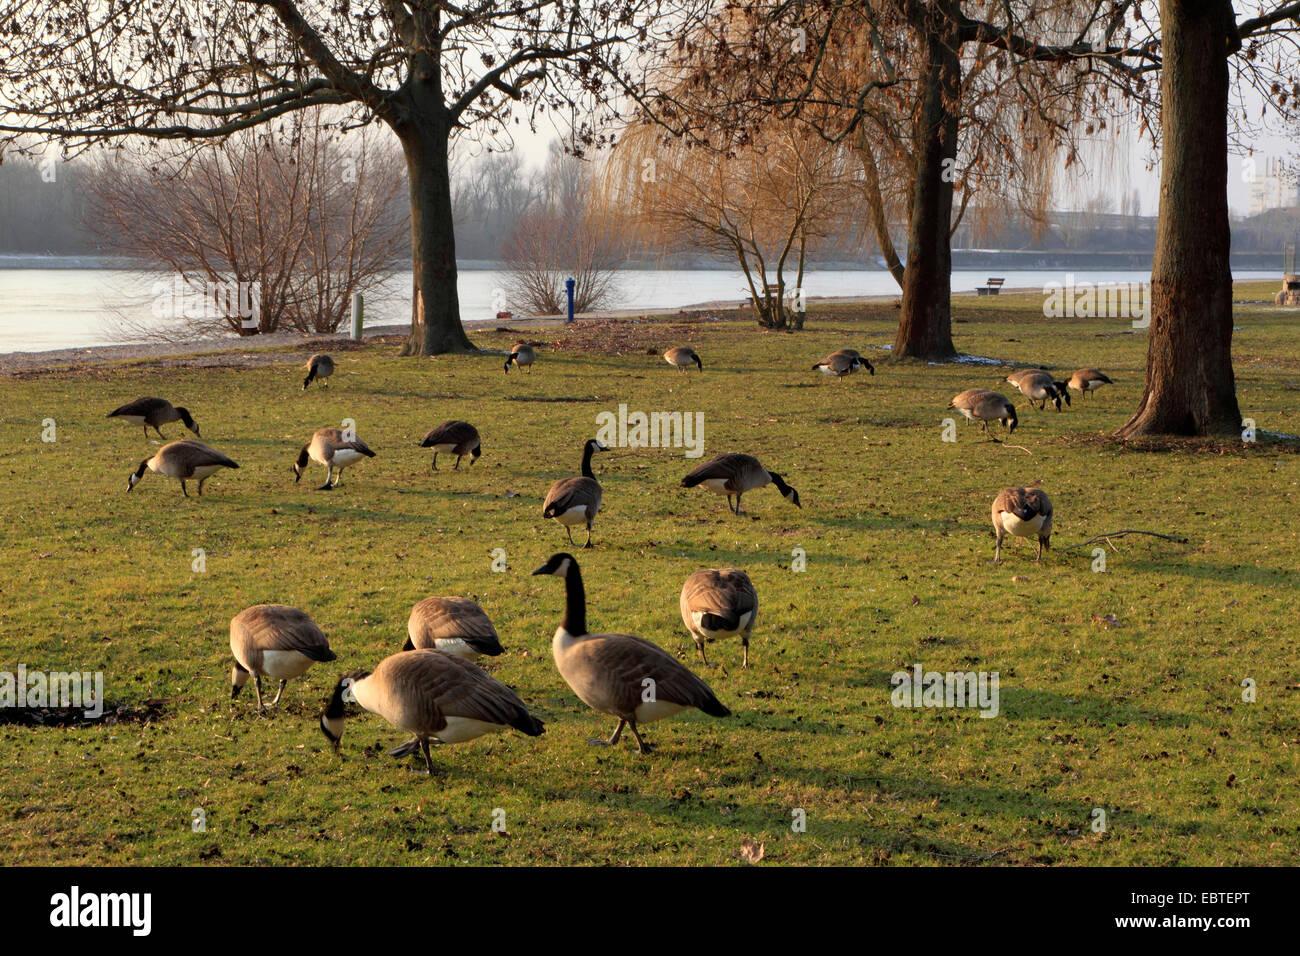 Canada goose (Branta canadensis), several birds at the Rhine shore, Germany - Stock Image